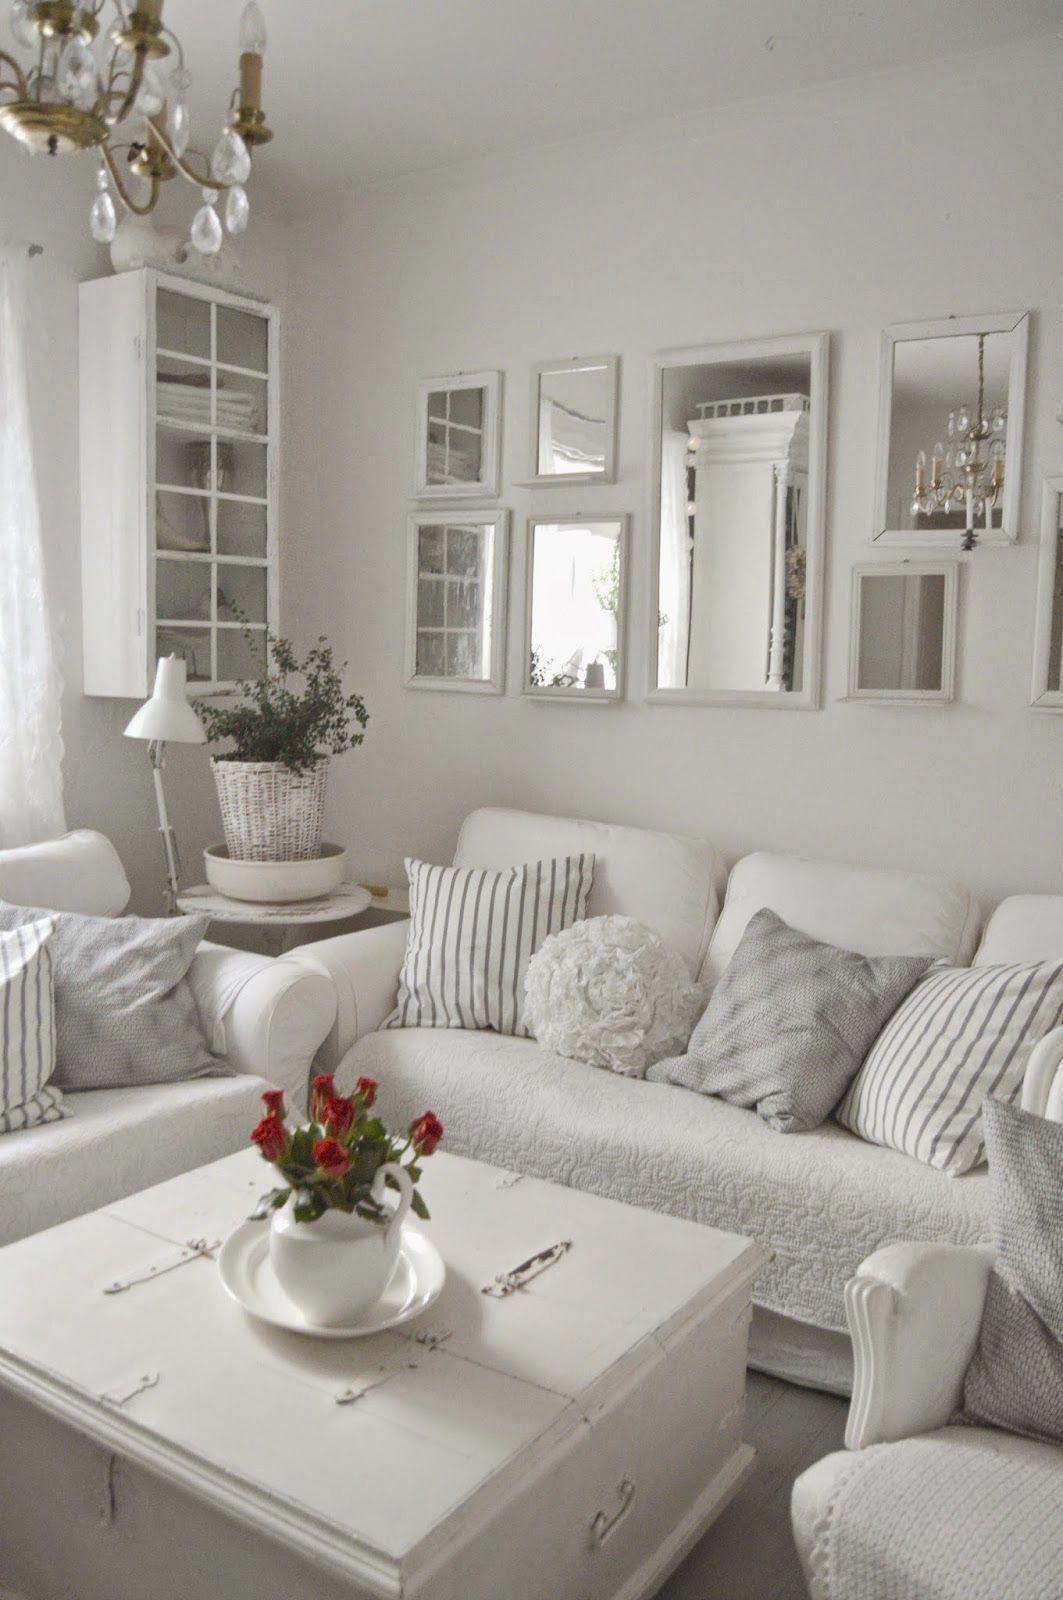 Shabby Chic Bohemian Interiors En 2020 Deco Maison Salon Shabby Chic Decoration Maison